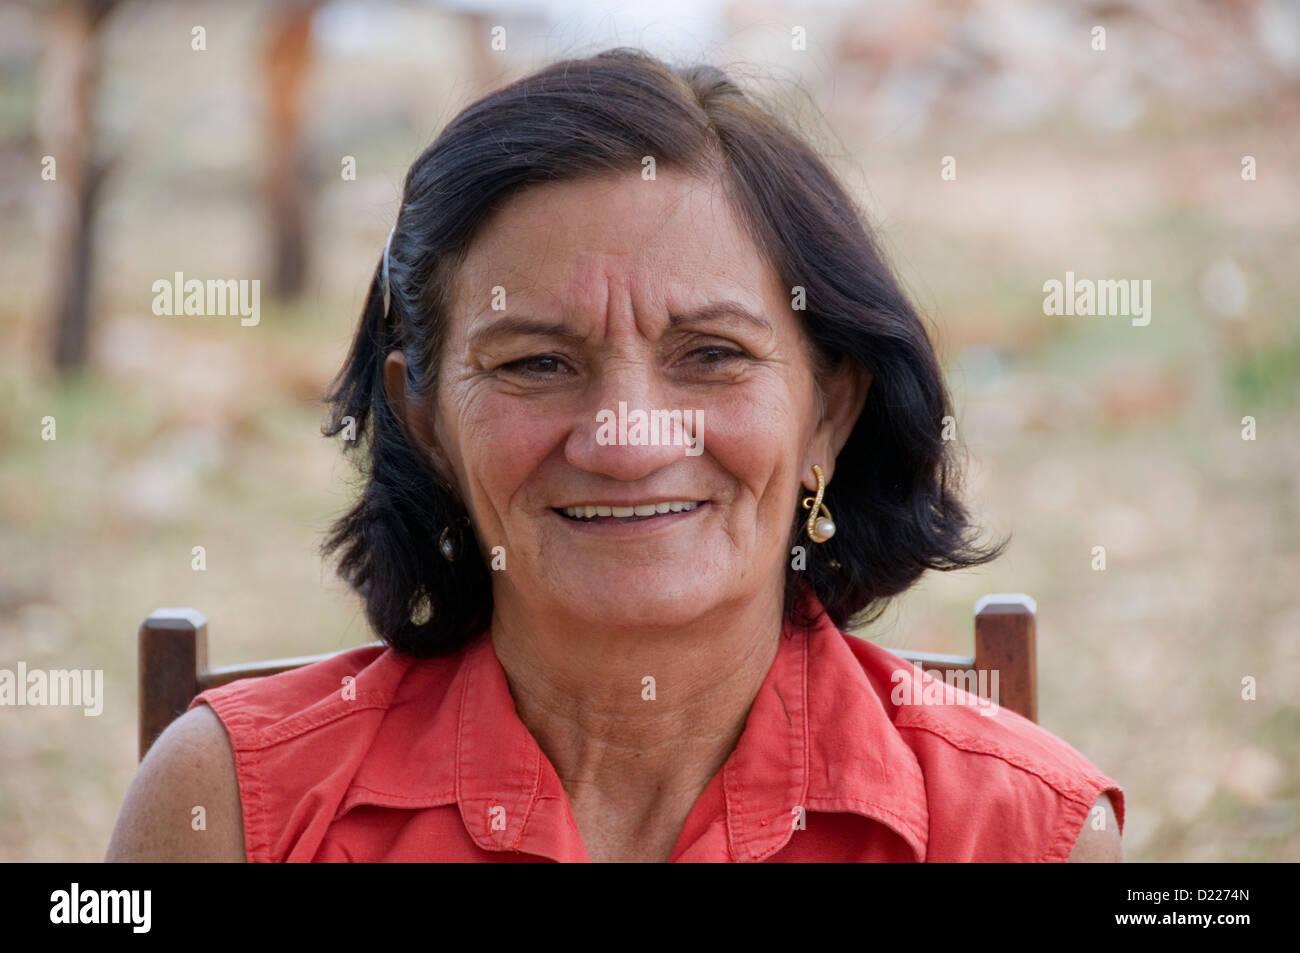 old brazilian woman stock photo: 52909941 - alamy